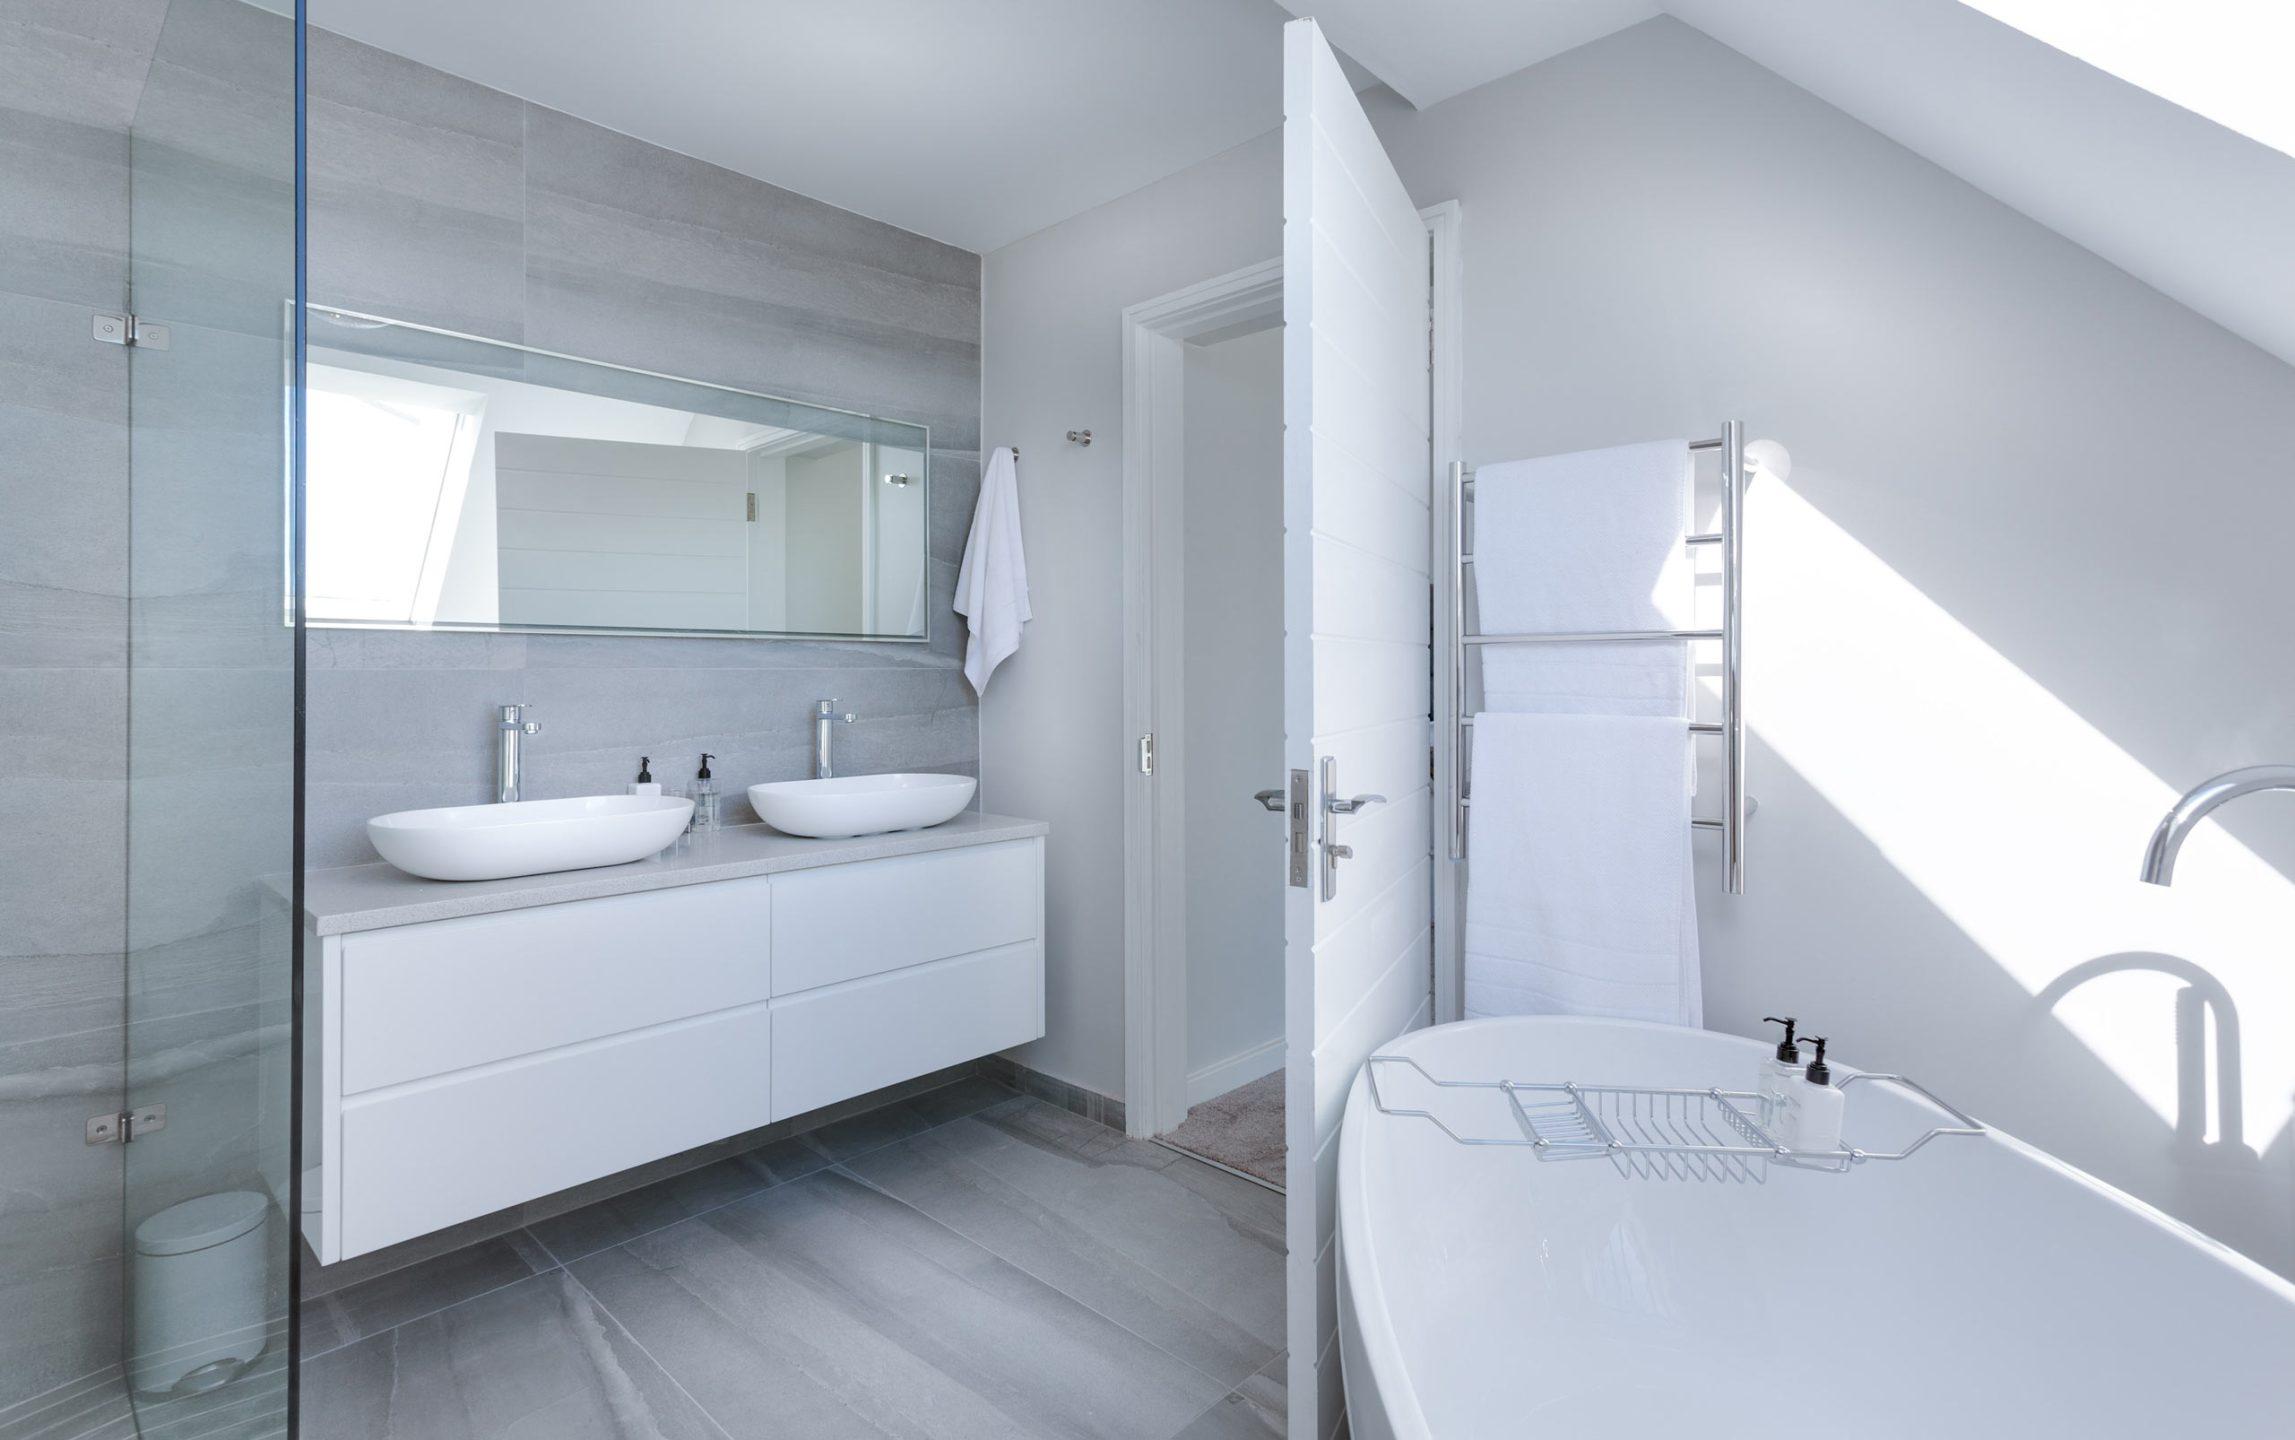 Bathroom interoir